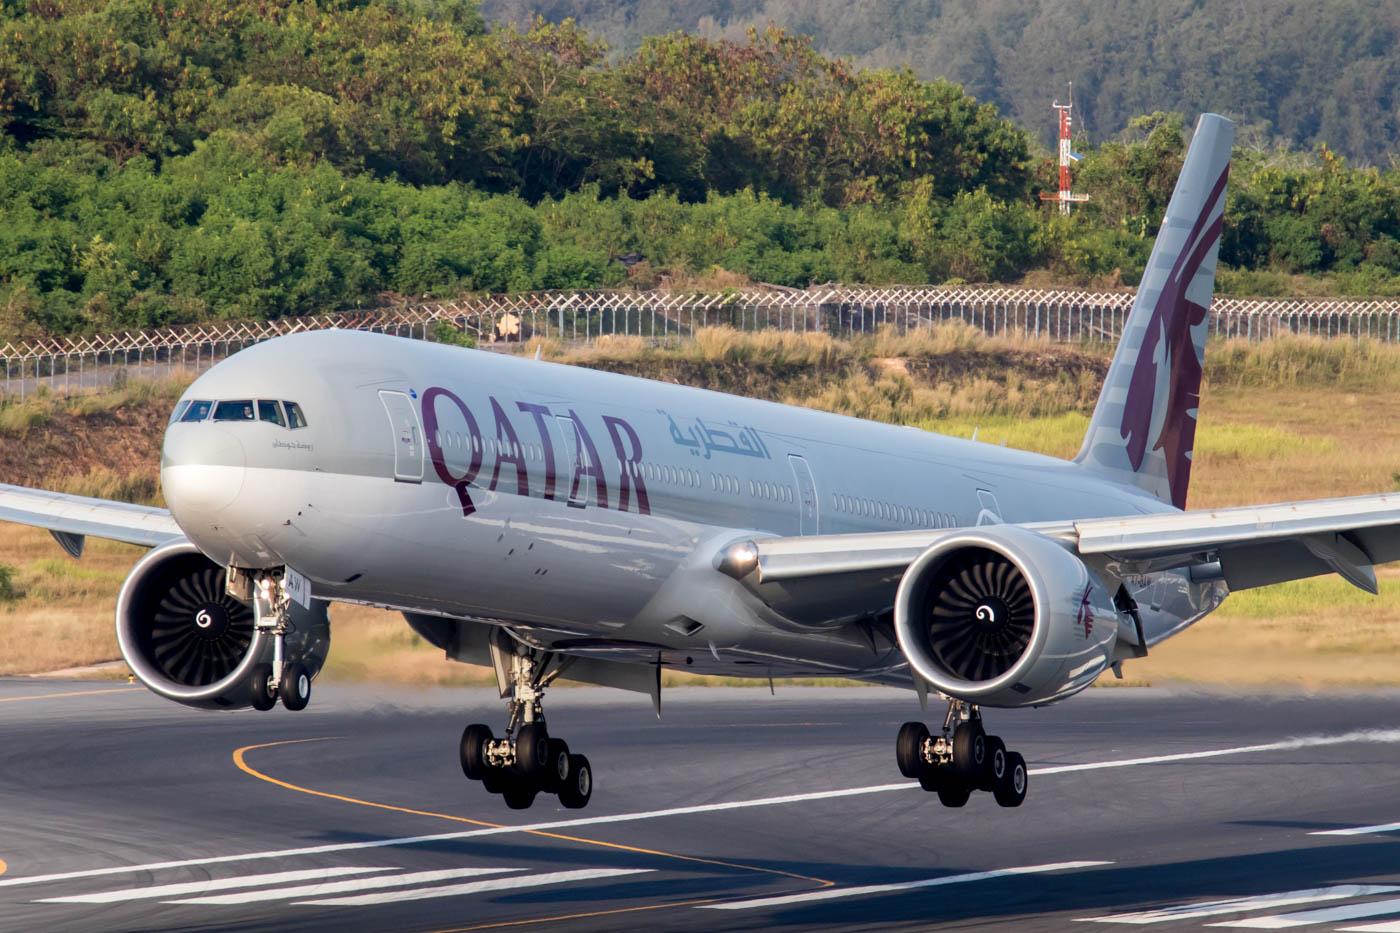 Qatar Airways 777-300ER at Phuket Airport